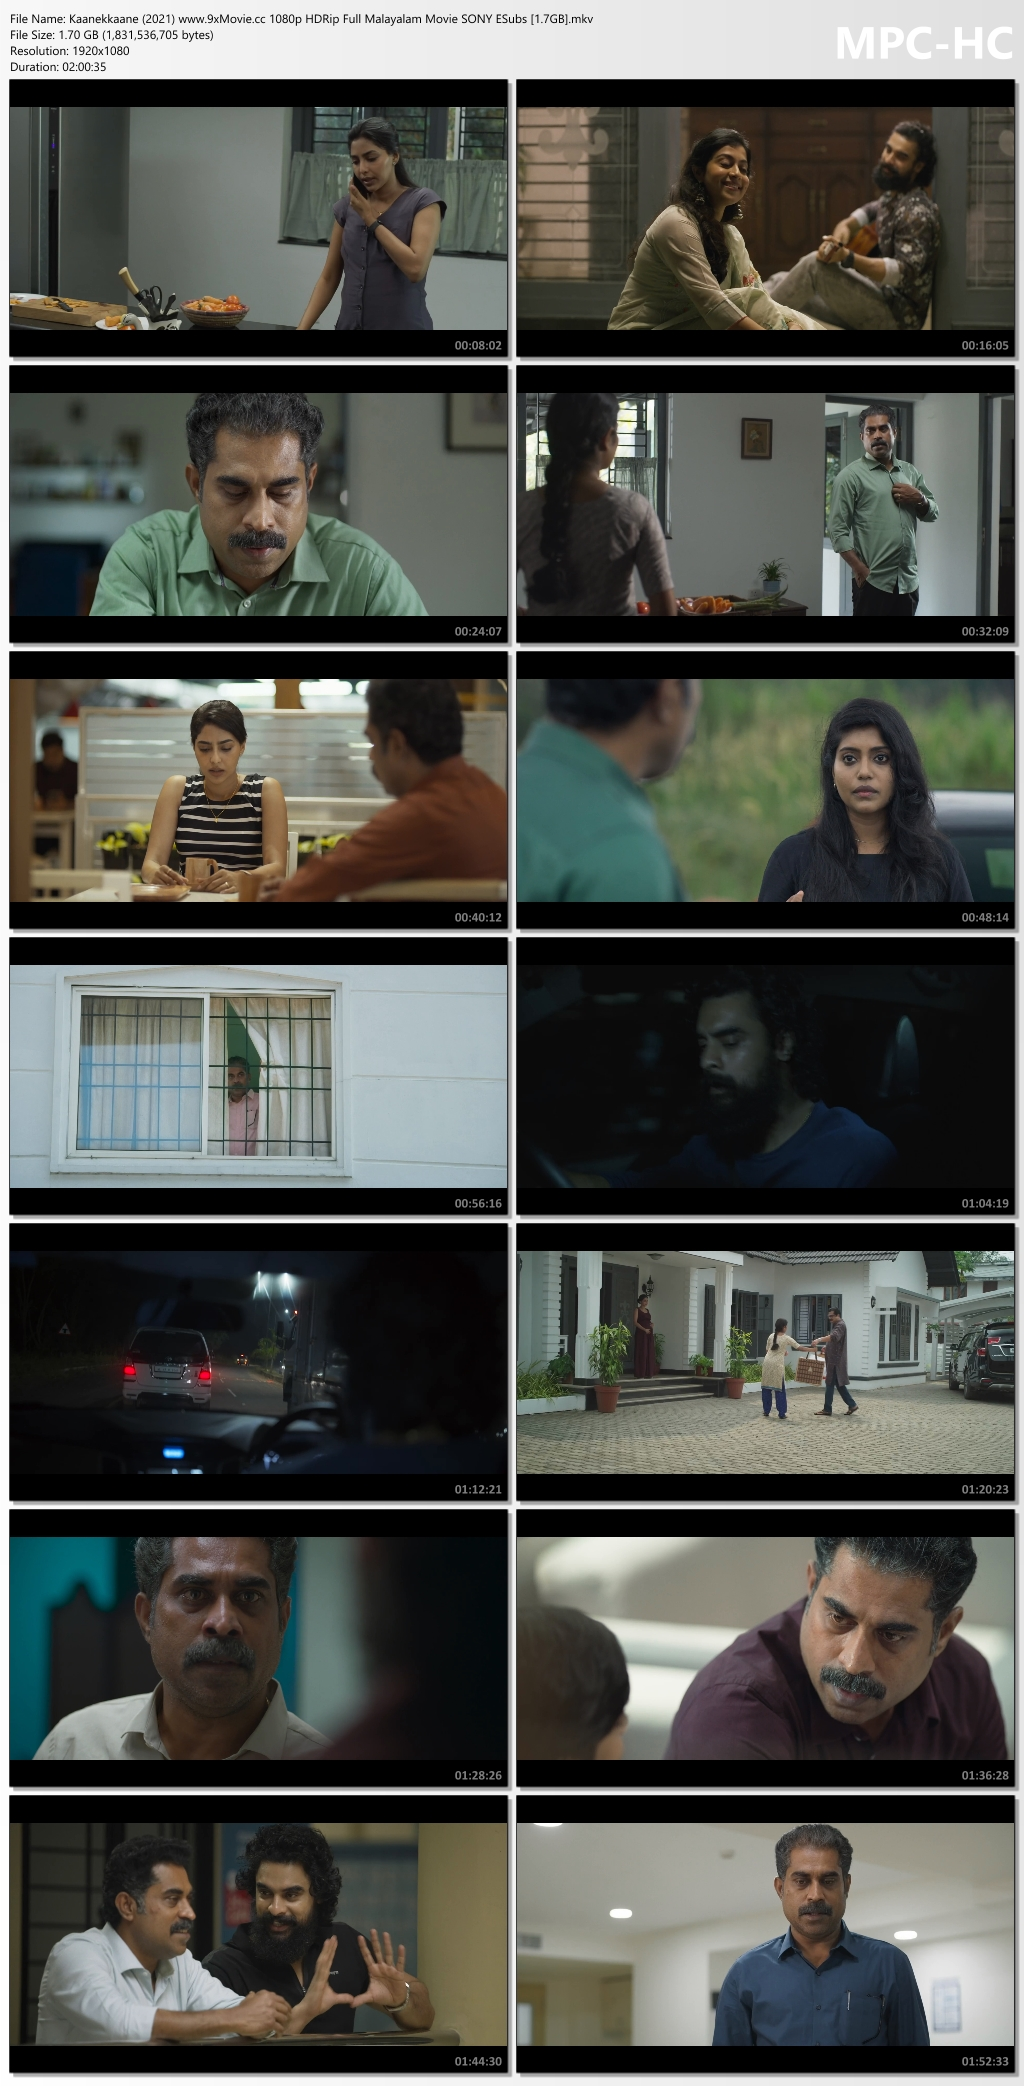 Kaanekkaane-2021-www-9x-Movie-cc-1080p-HDRip-Full-Malayalam-Movie-SONY-ESubs-1-7-GB-mkv